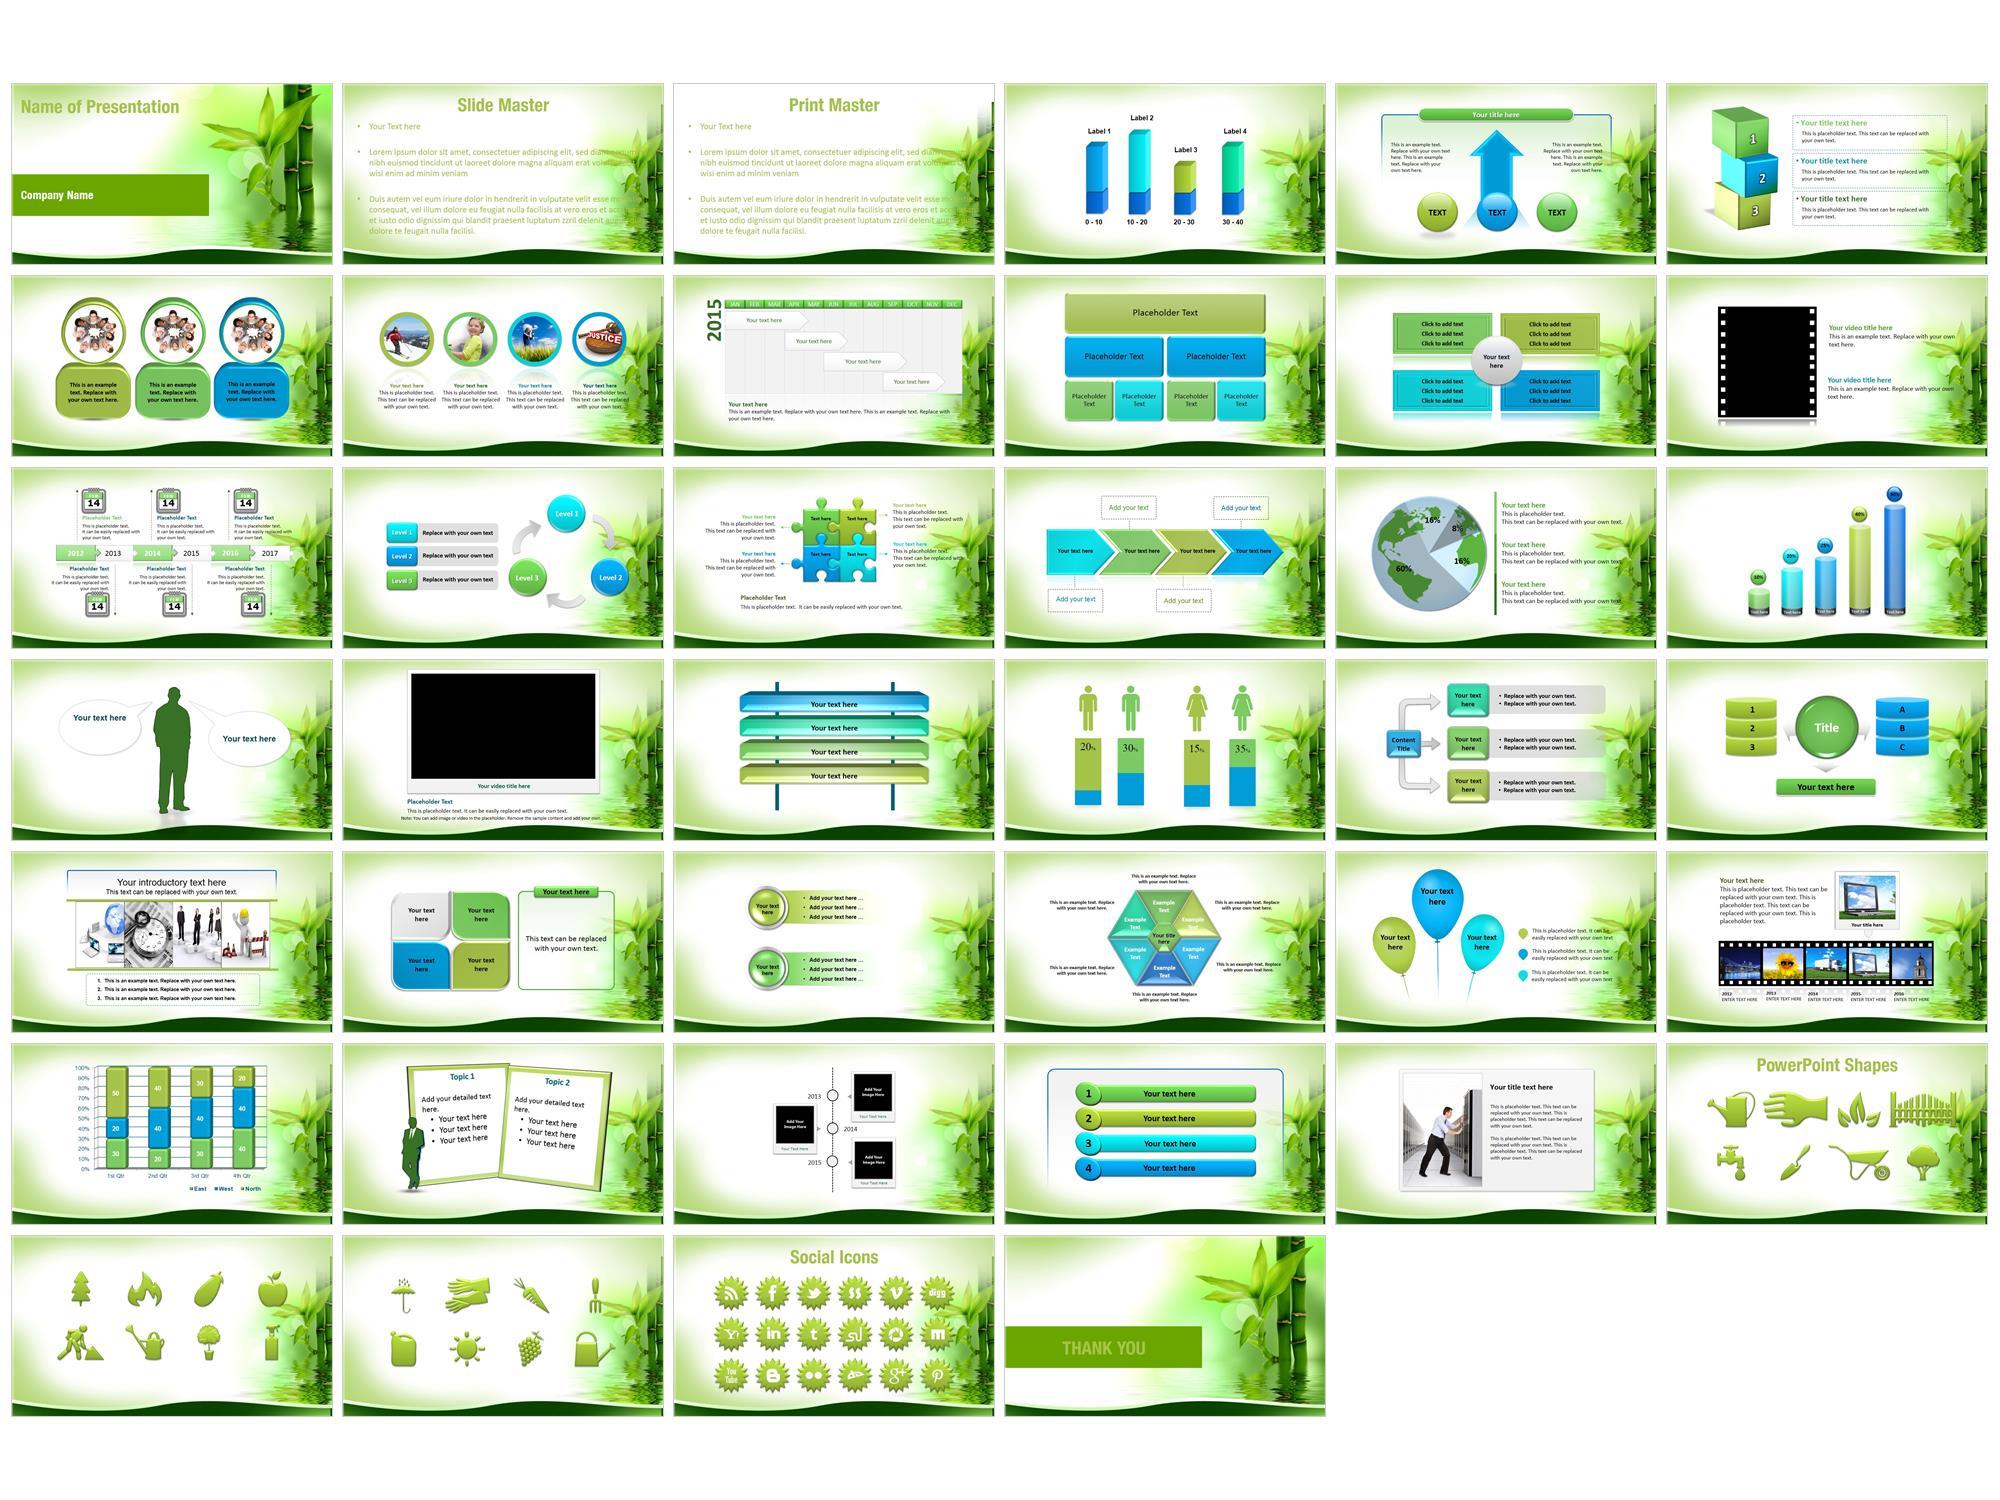 Presentation zen powerpoint templates mandegarfo presentation zen powerpoint templates toneelgroepblik Images